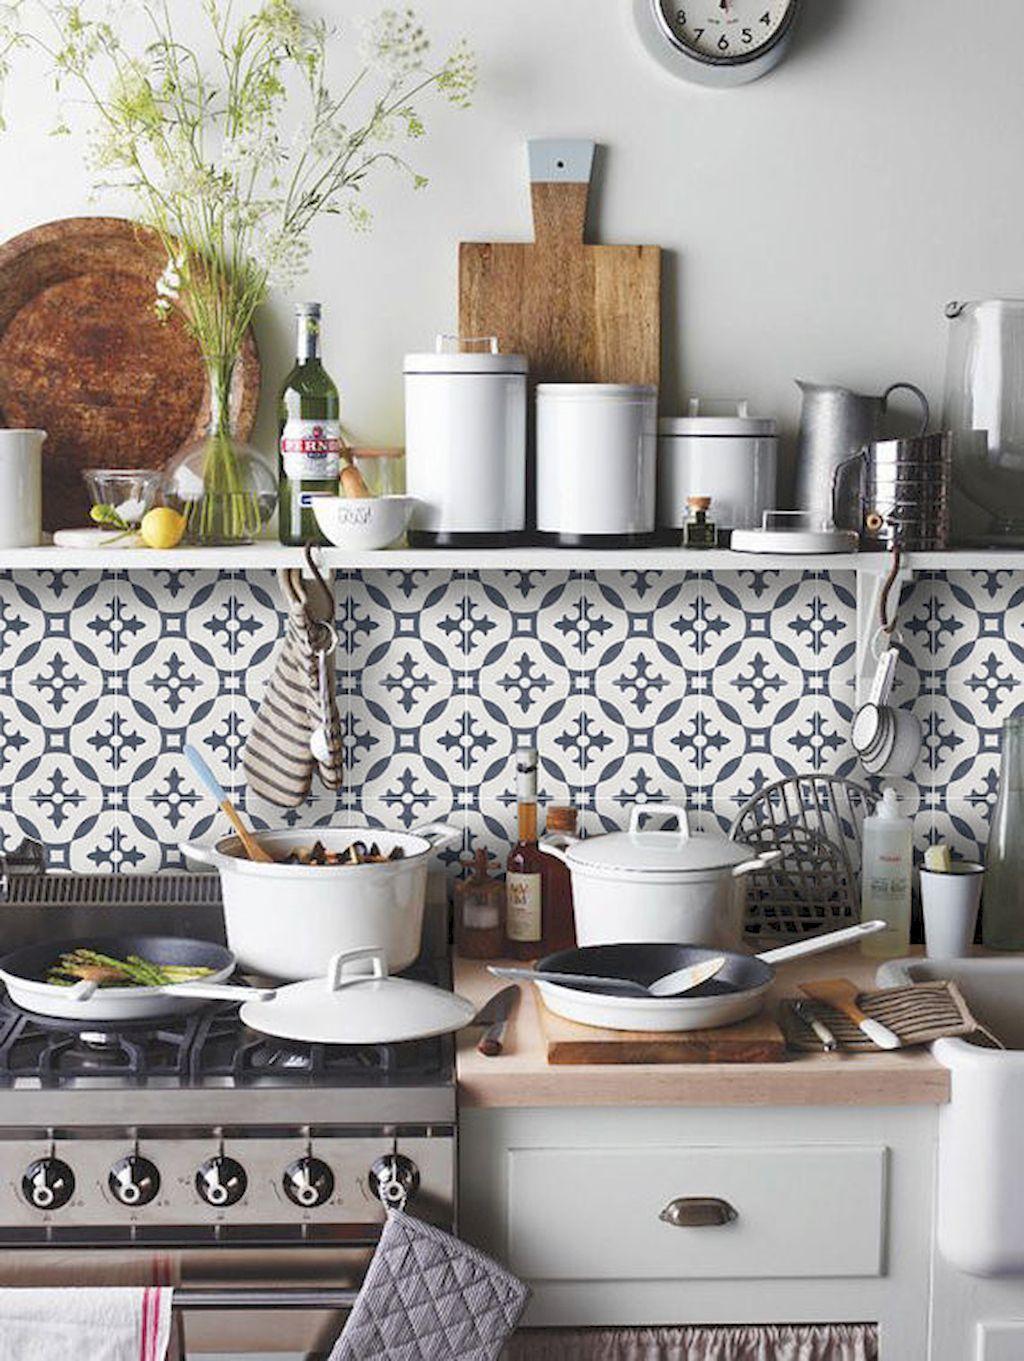 Genius tiny house kitchen ideas Tiny houses Kitchens and House